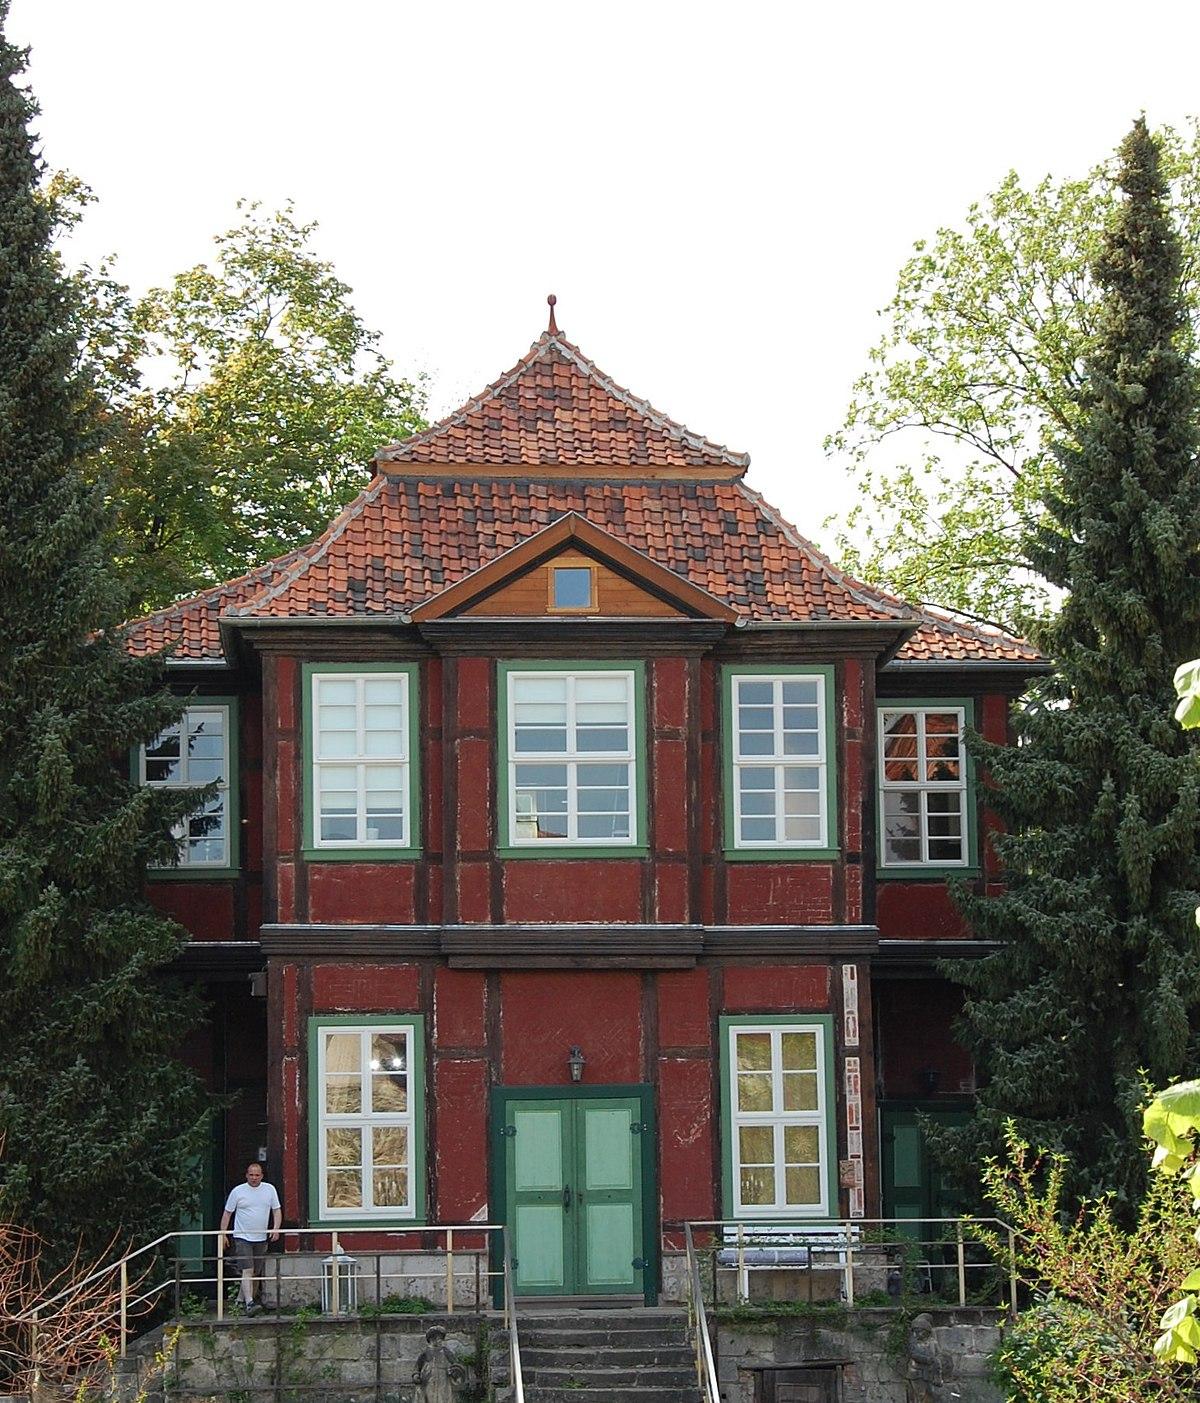 Haus Weingarten: Weingarten 1 (Quedlinburg)